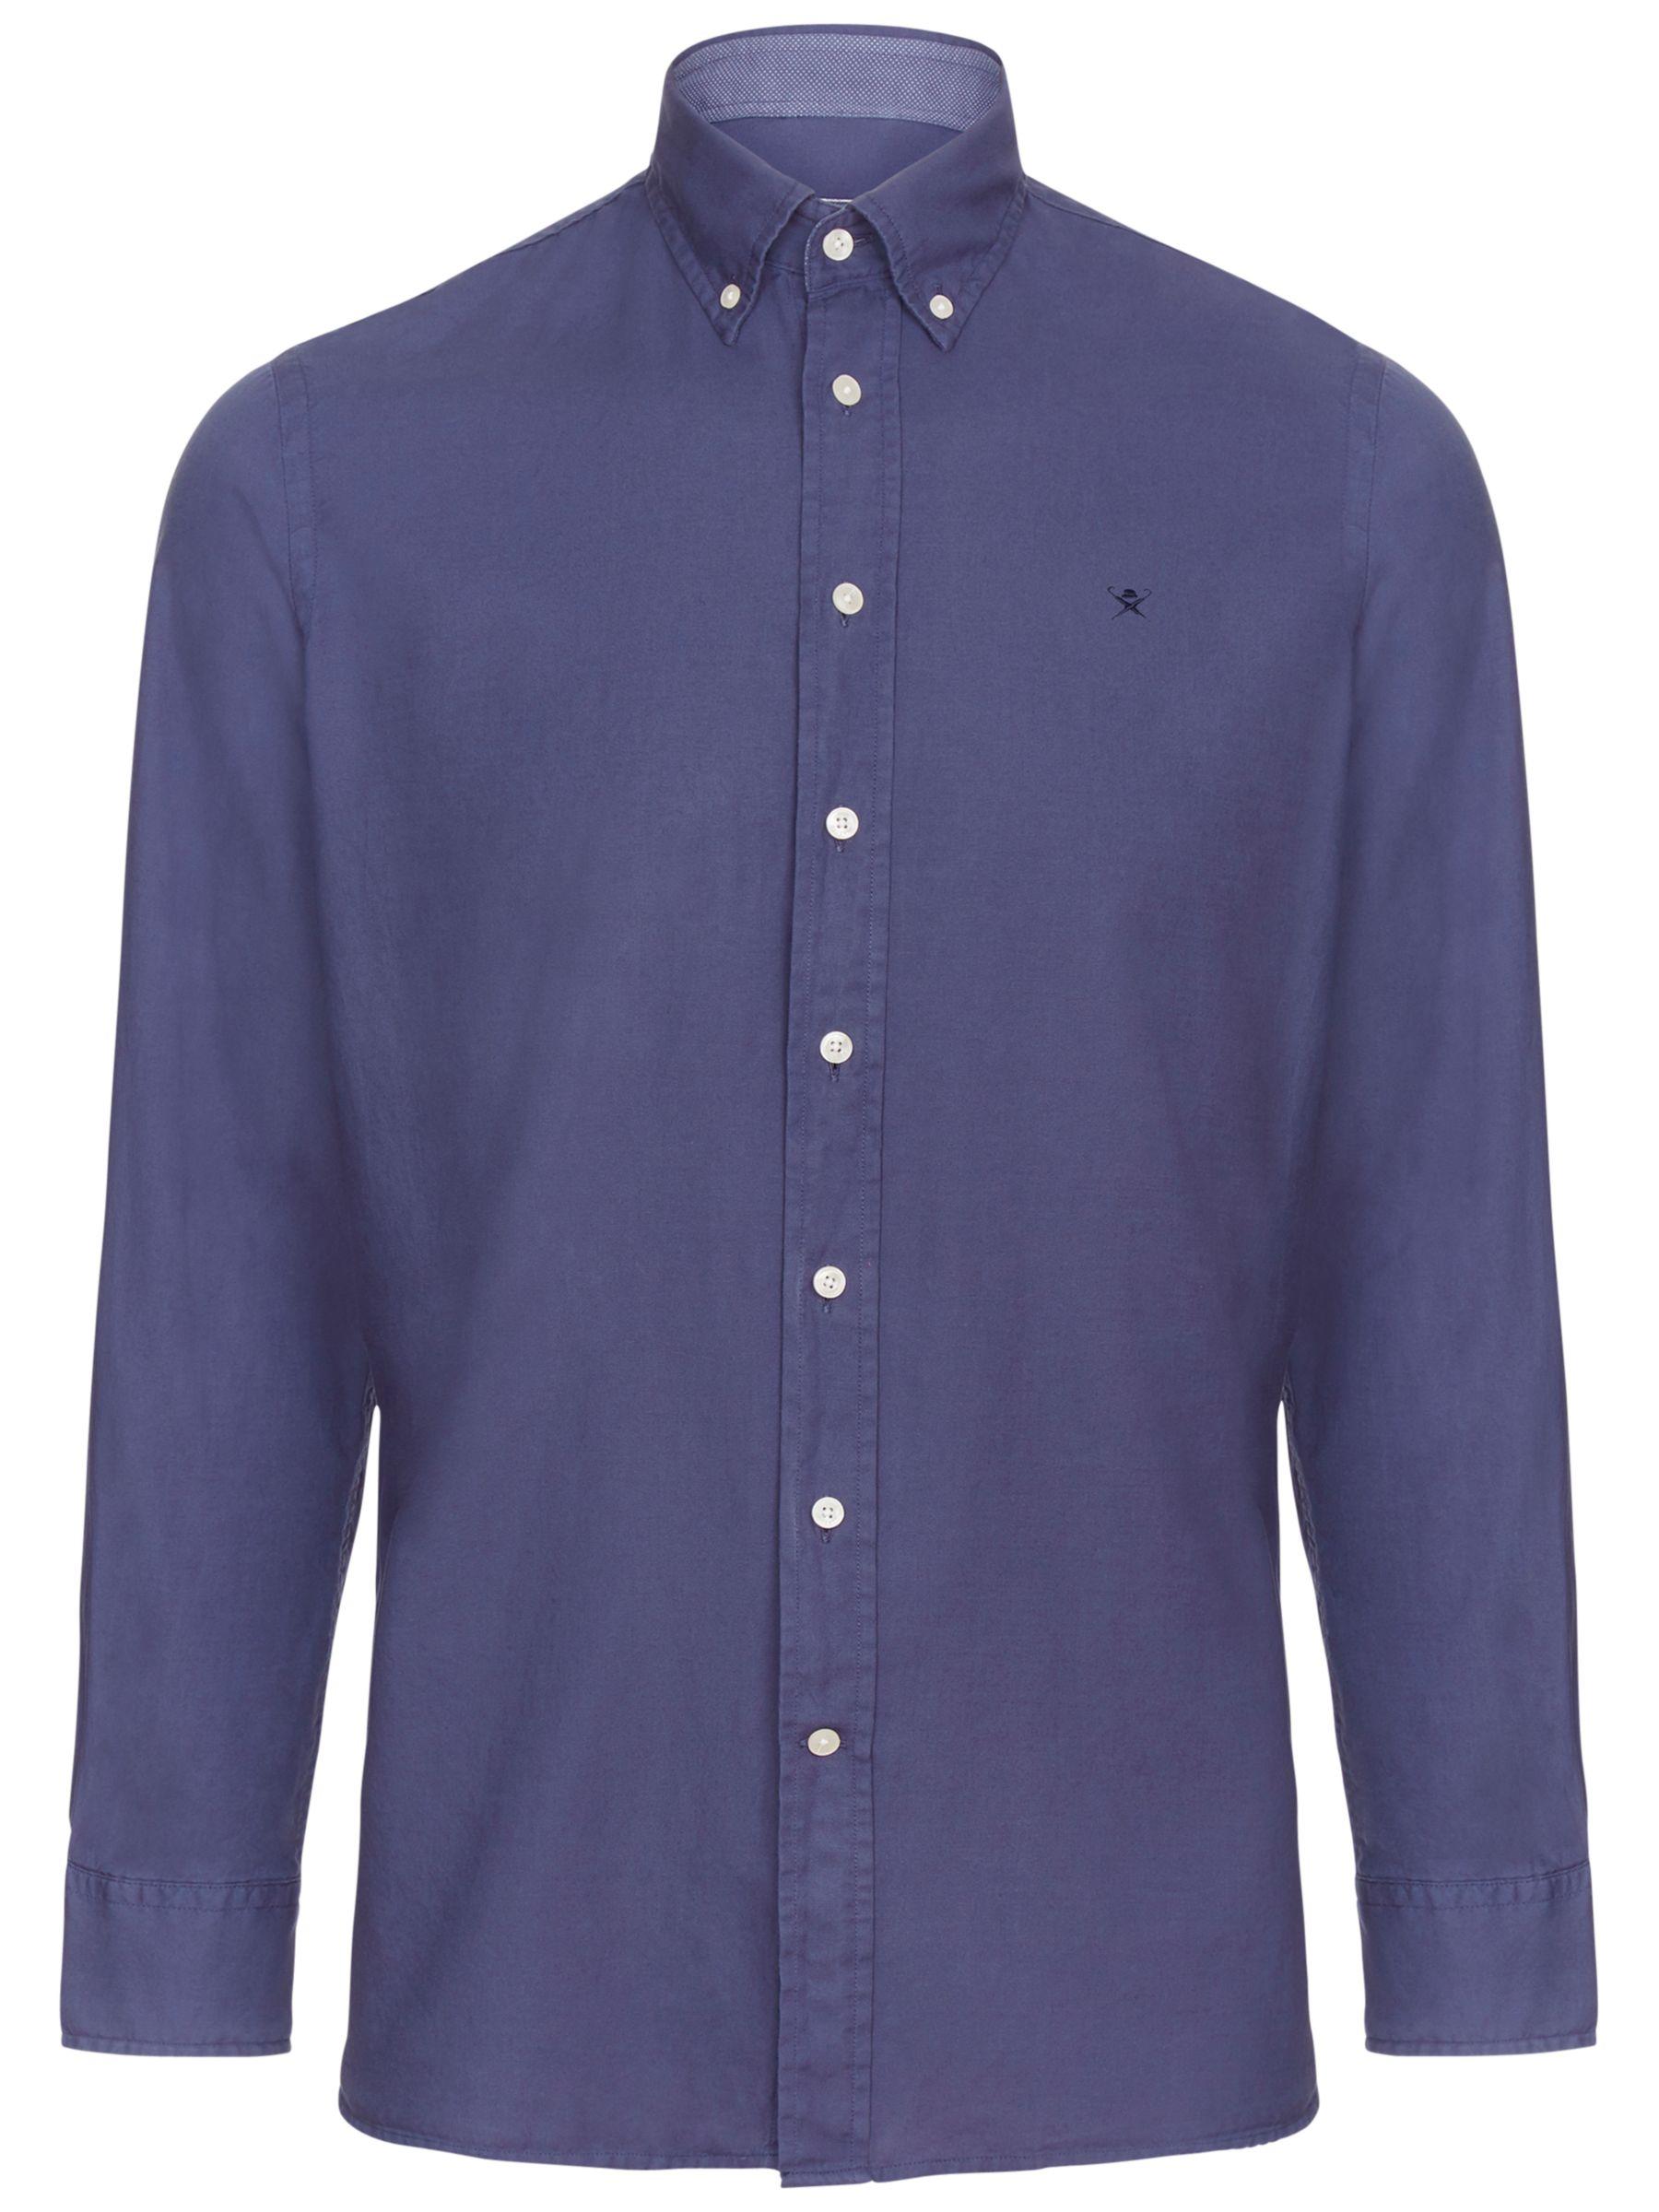 Hackett London Hackett London Garment Dye Oxford Slim Shirt, Dusty Navy